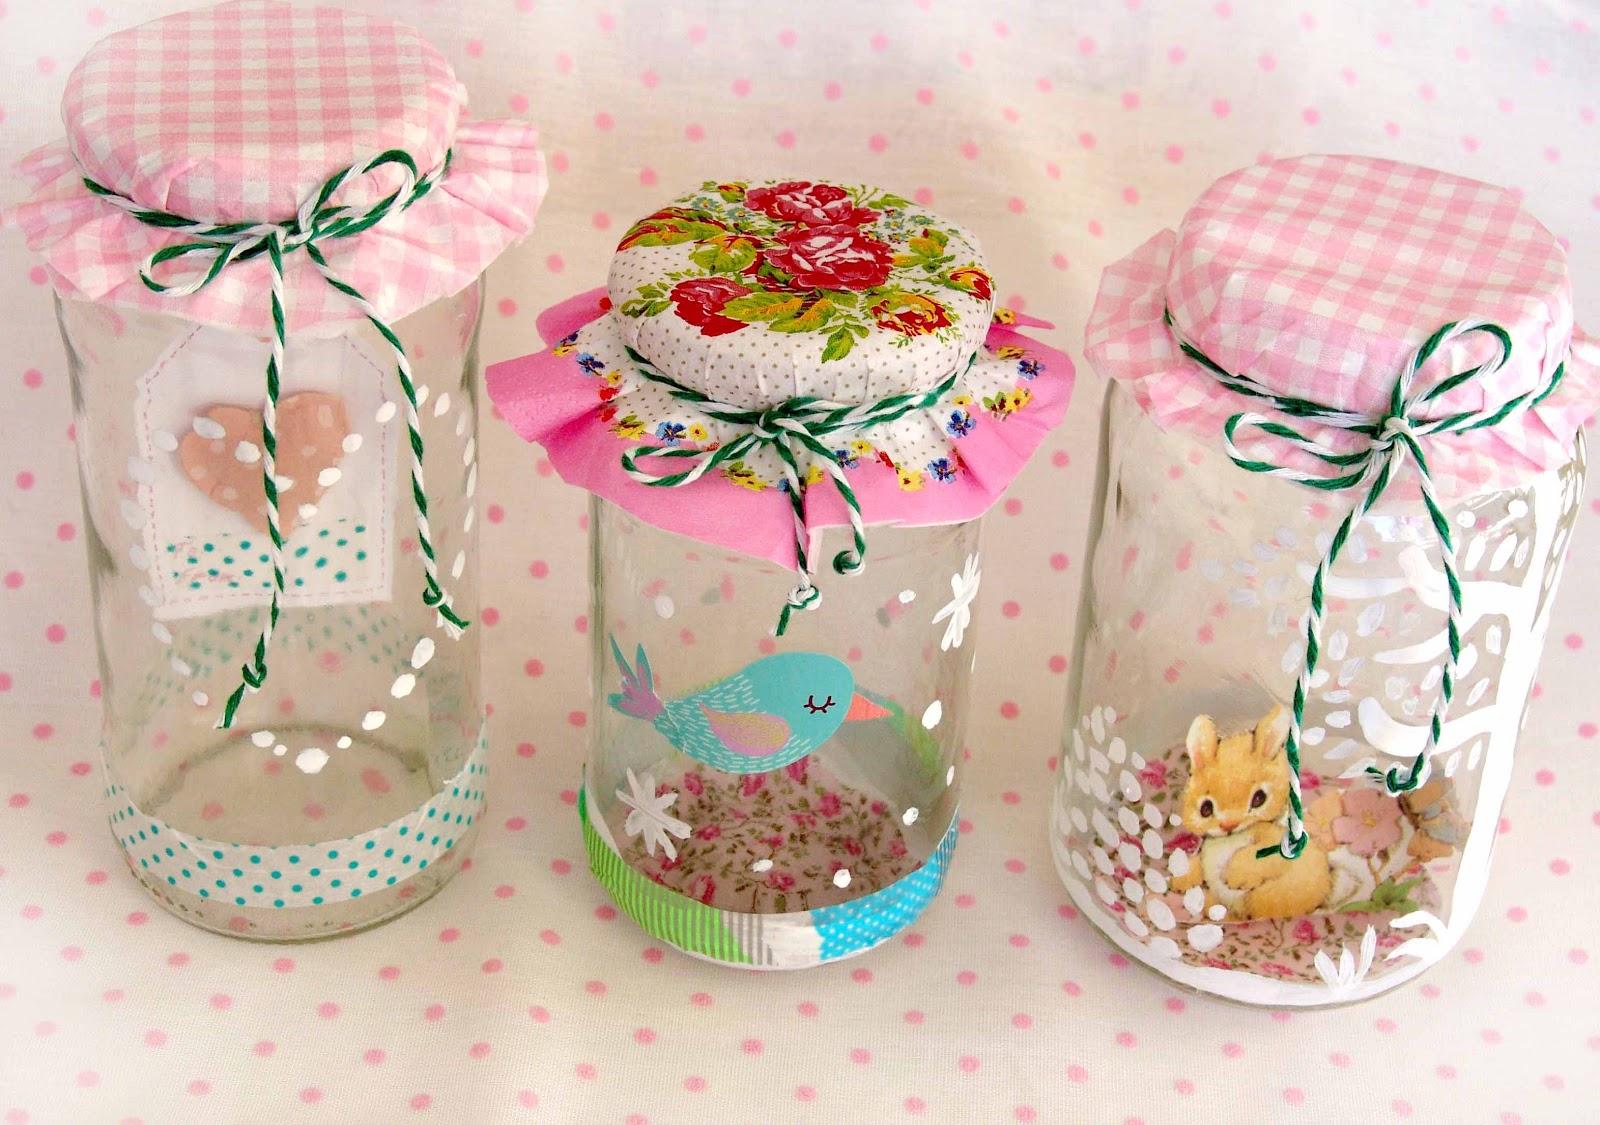 lalibelula tarros de cristal decorados